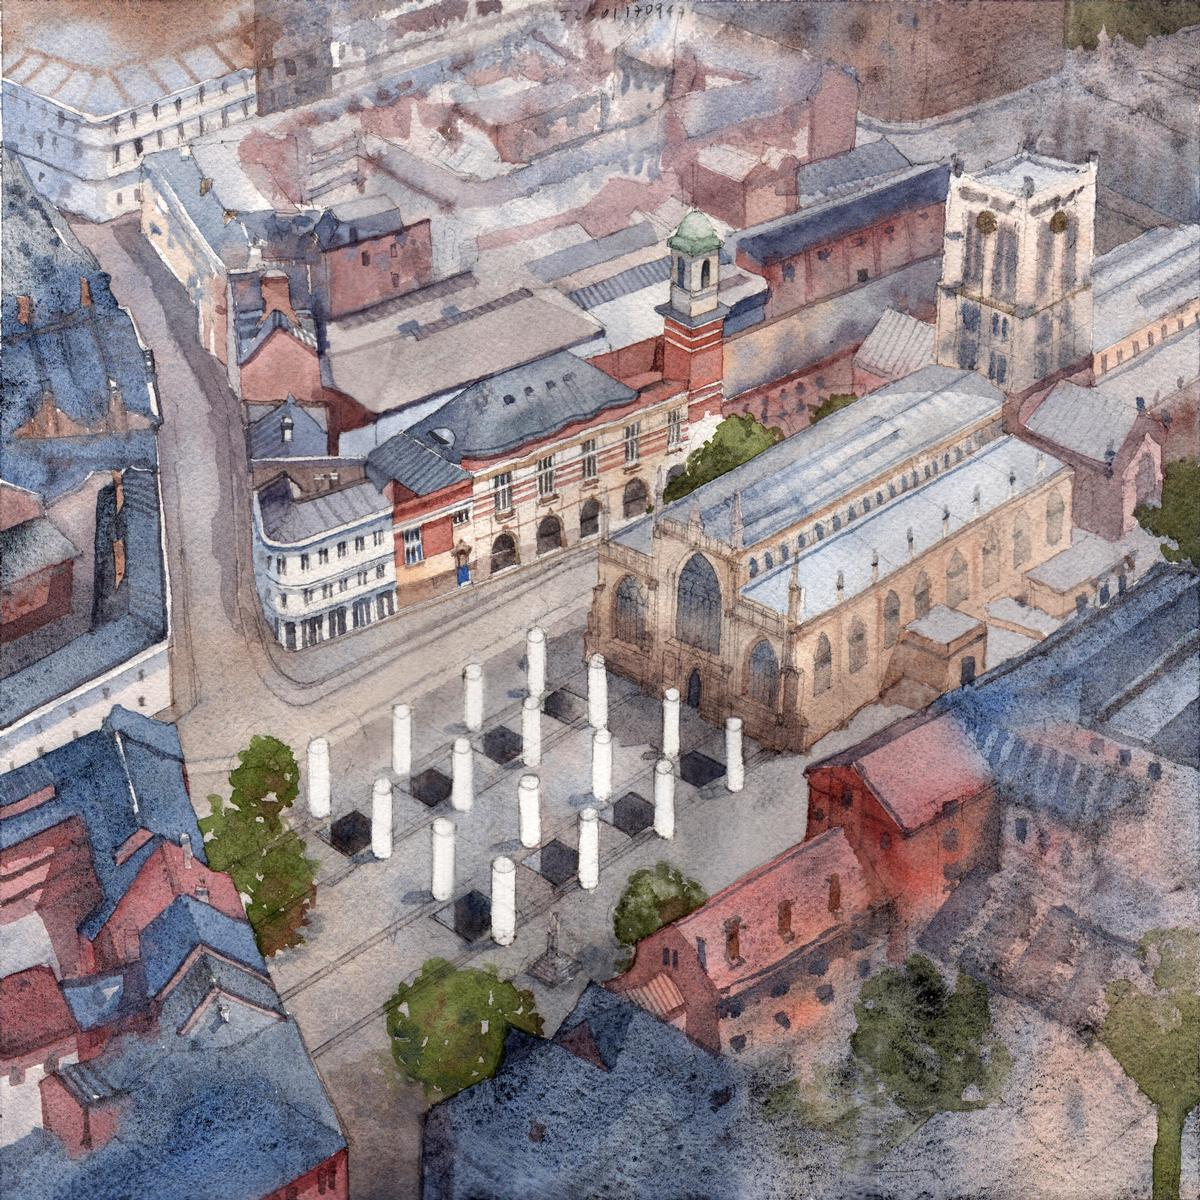 Pezo von Ellrichshausen and Felice Varini design Hull public pavilion for UK City of Culture 2017